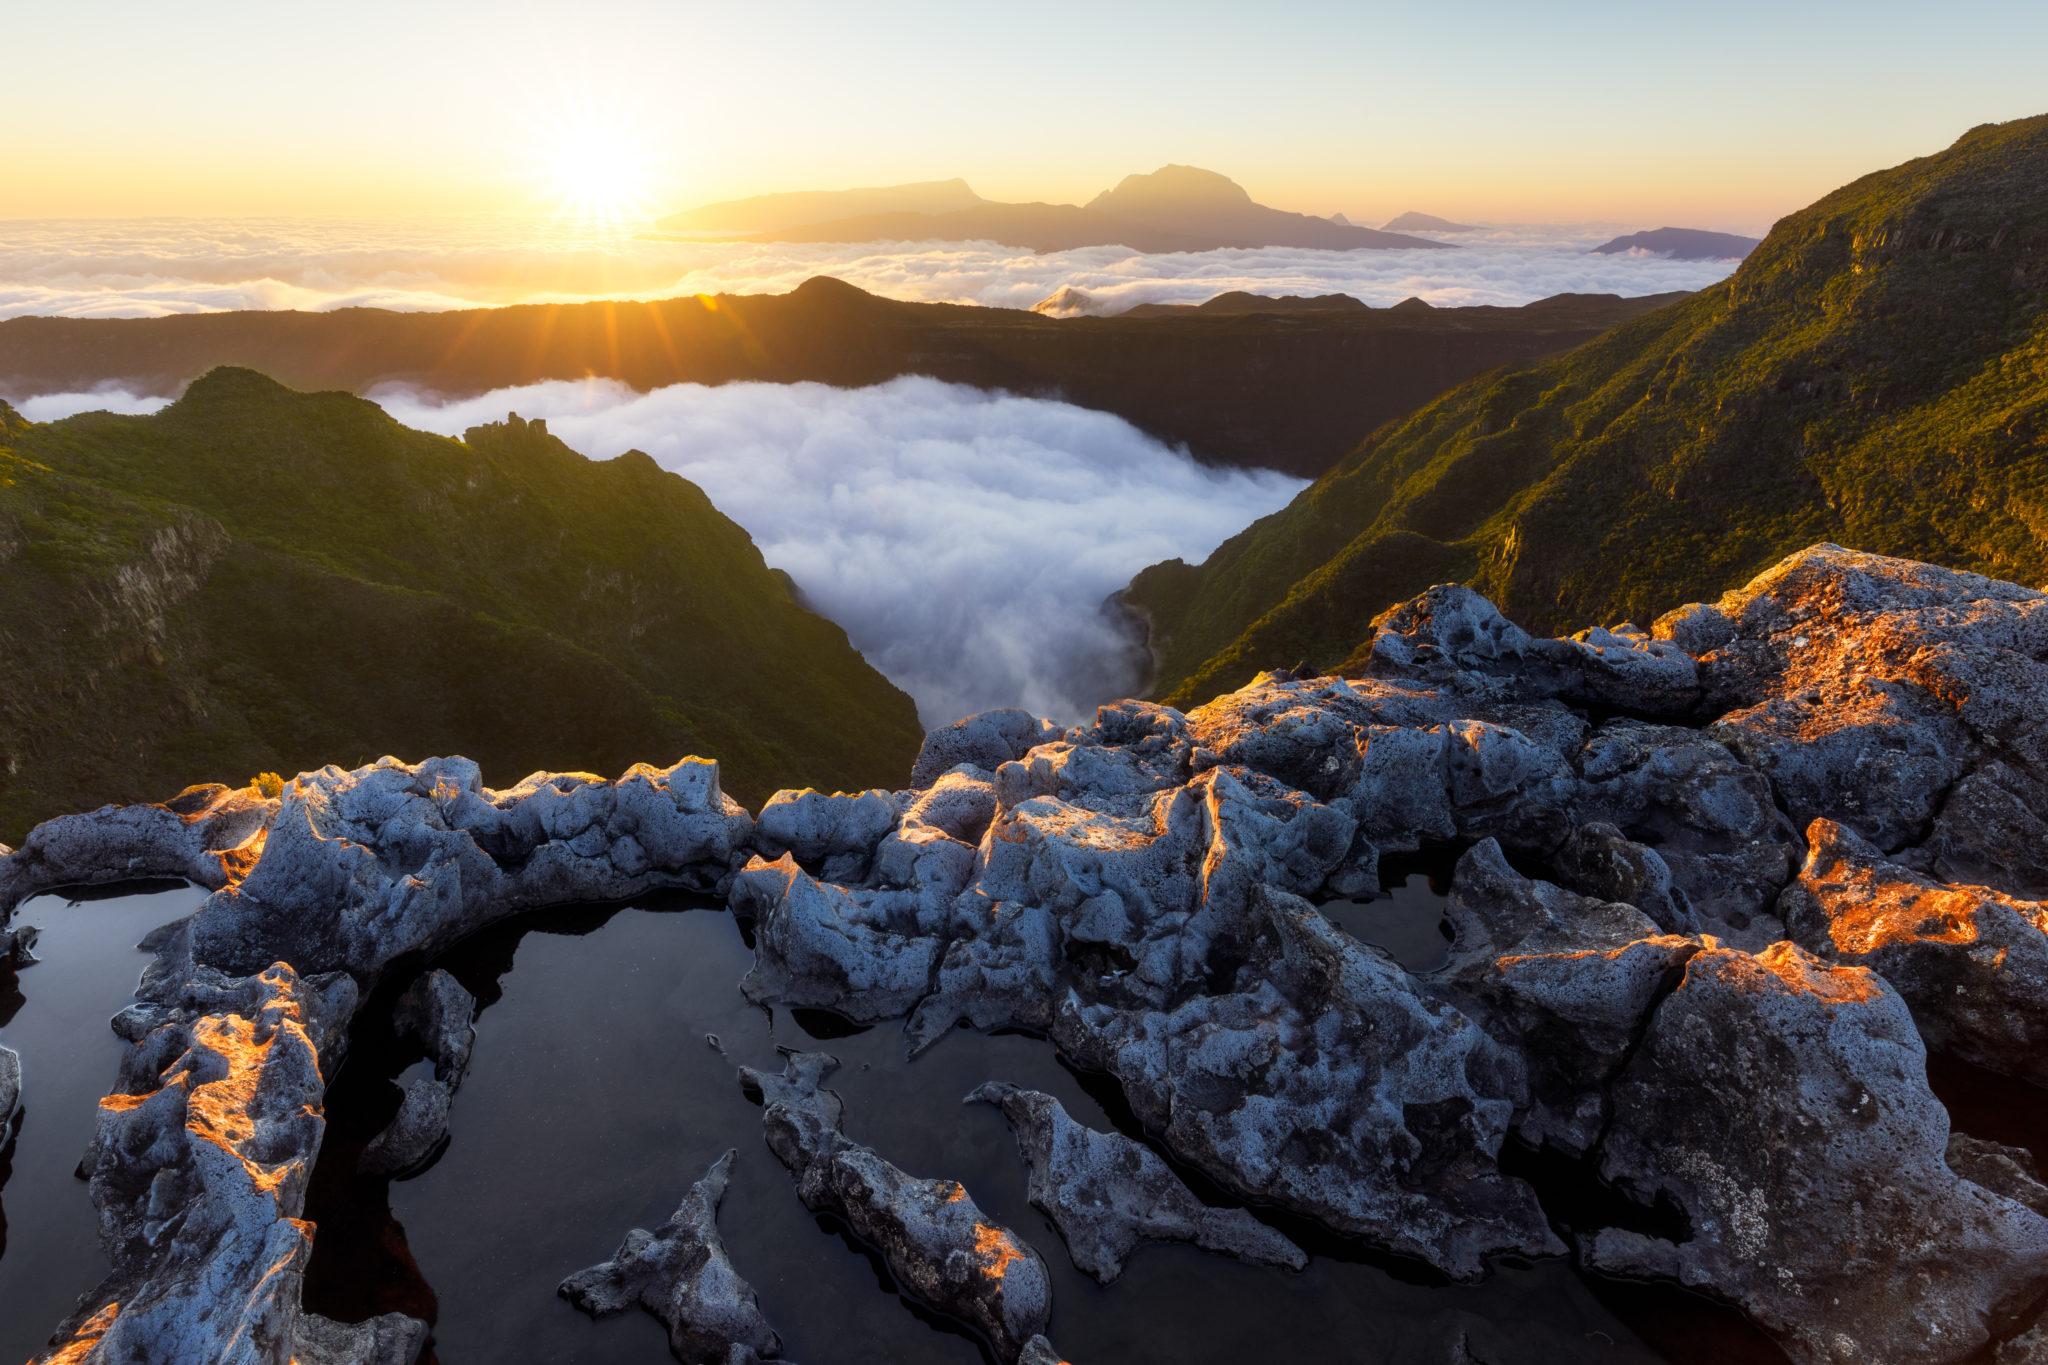 Sonnenuntergang auf La Réunion